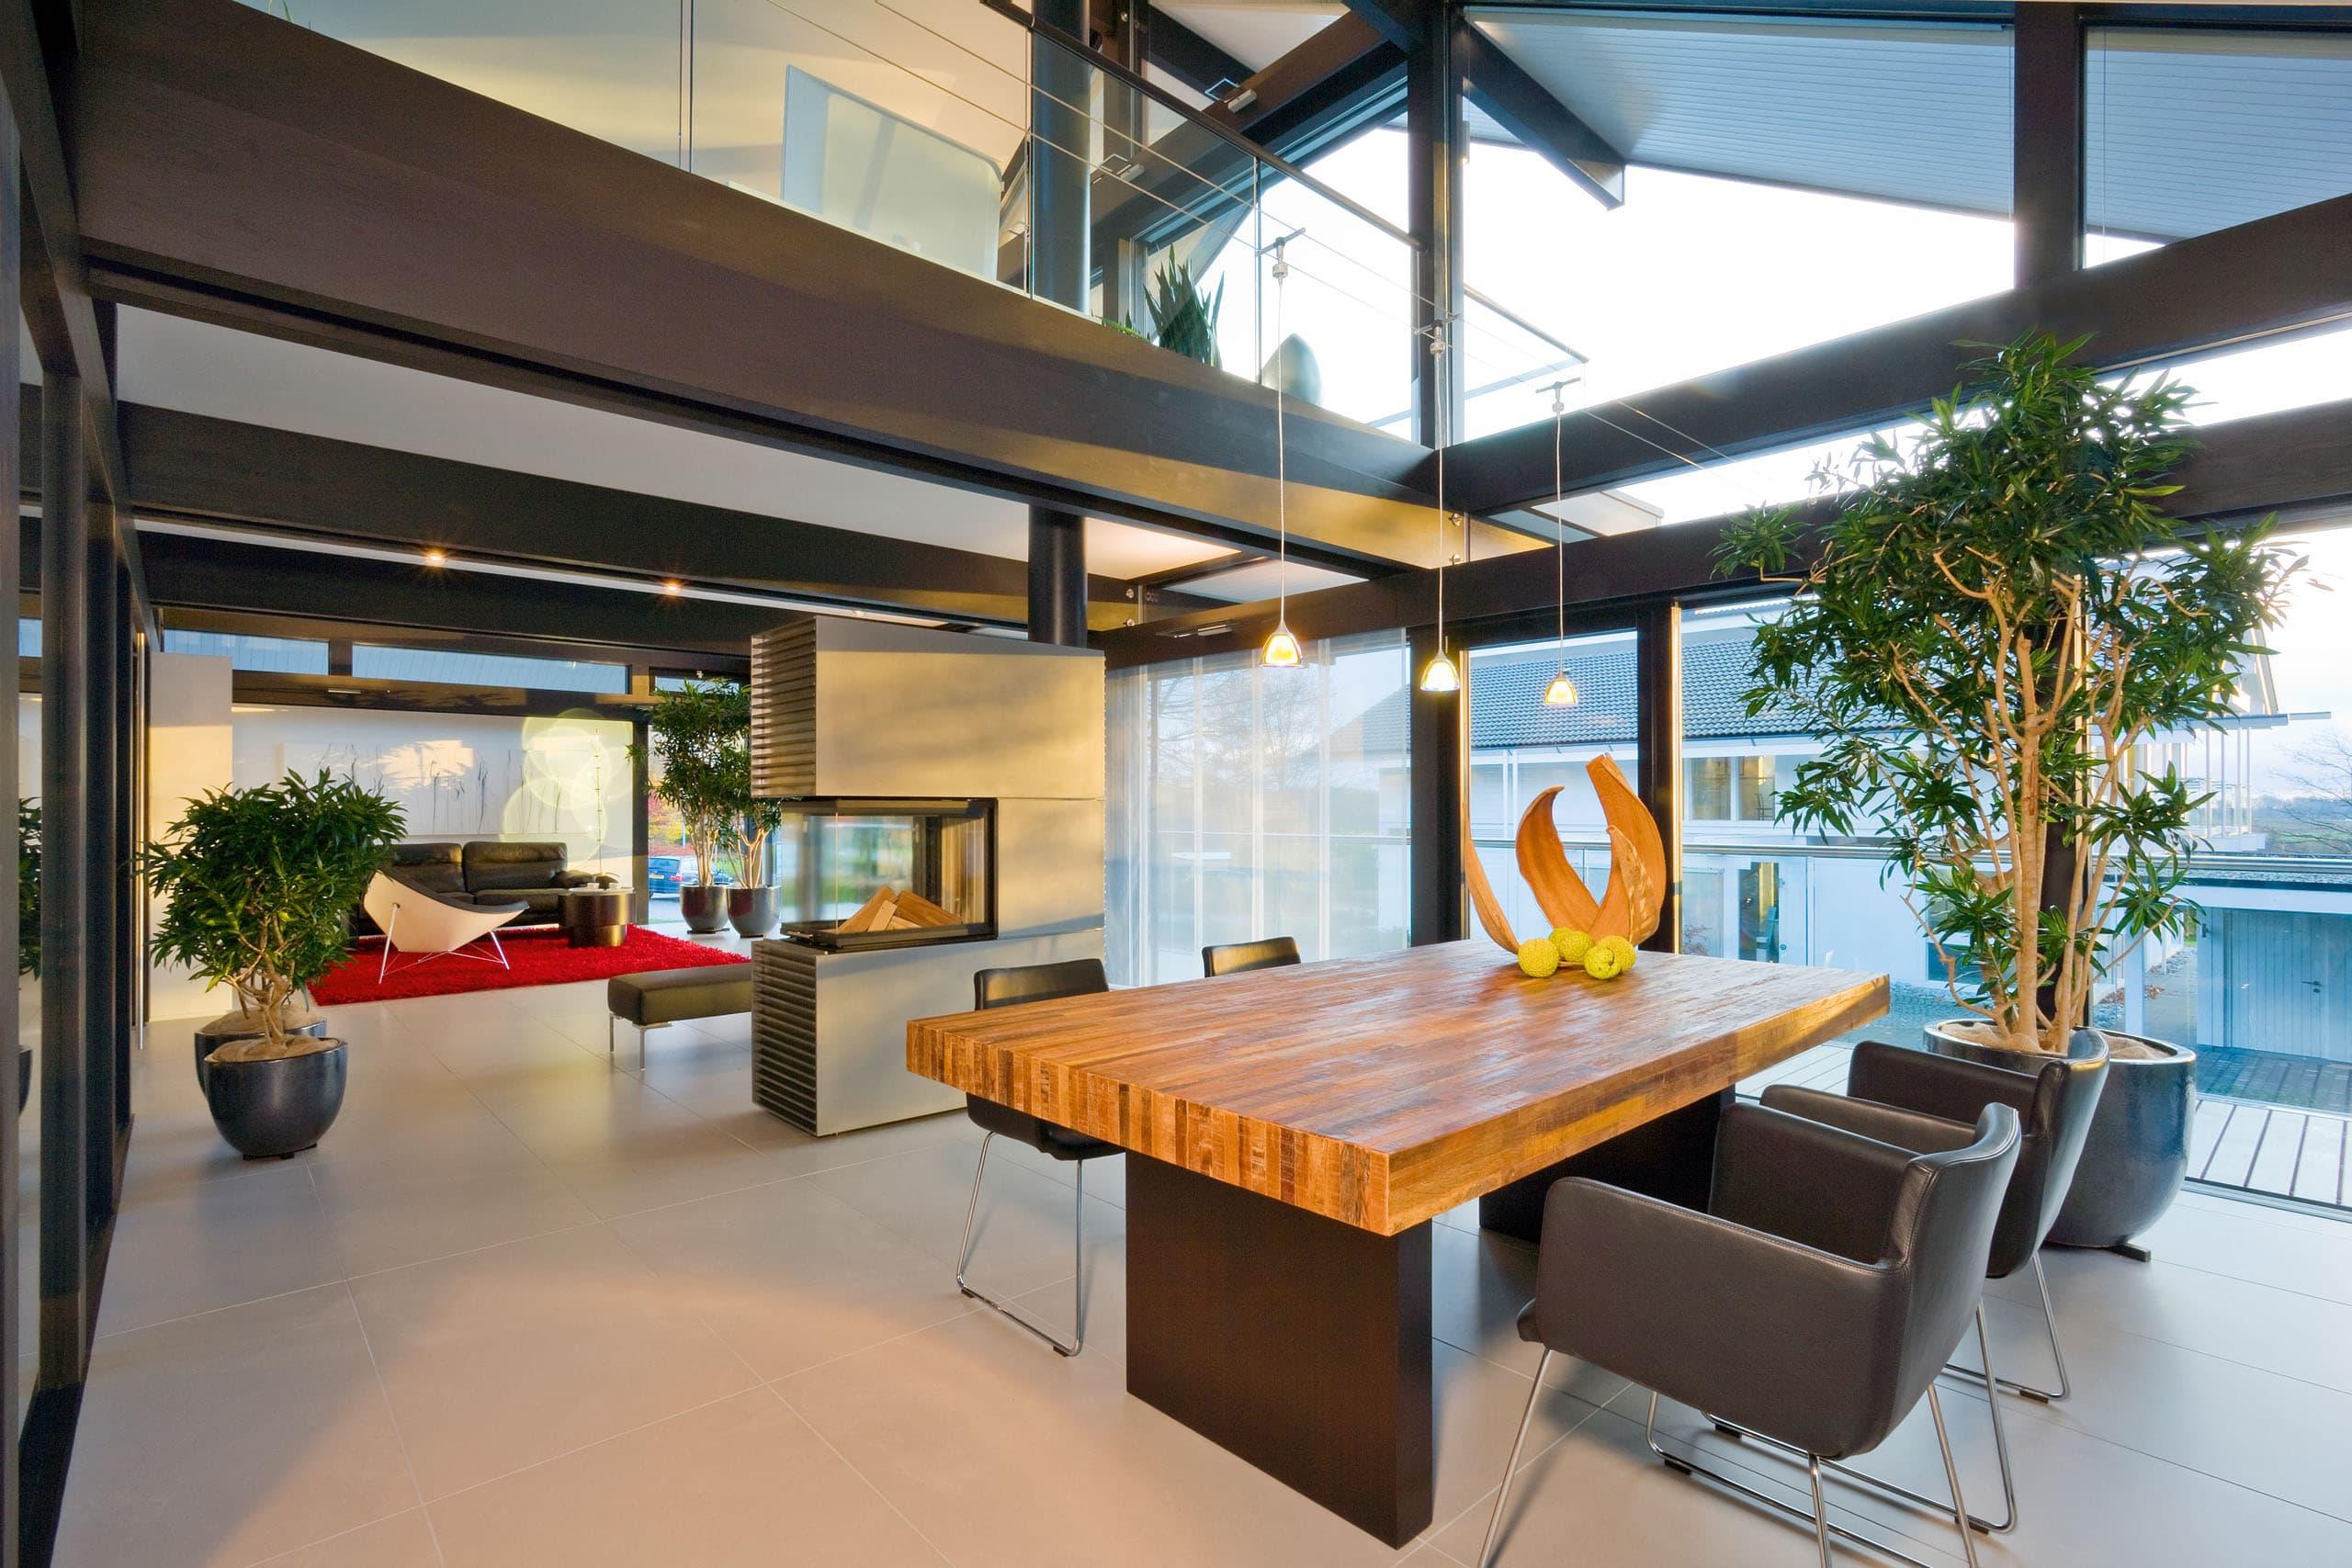 huf haus musterhaus art 5 hartenfels. Black Bedroom Furniture Sets. Home Design Ideas